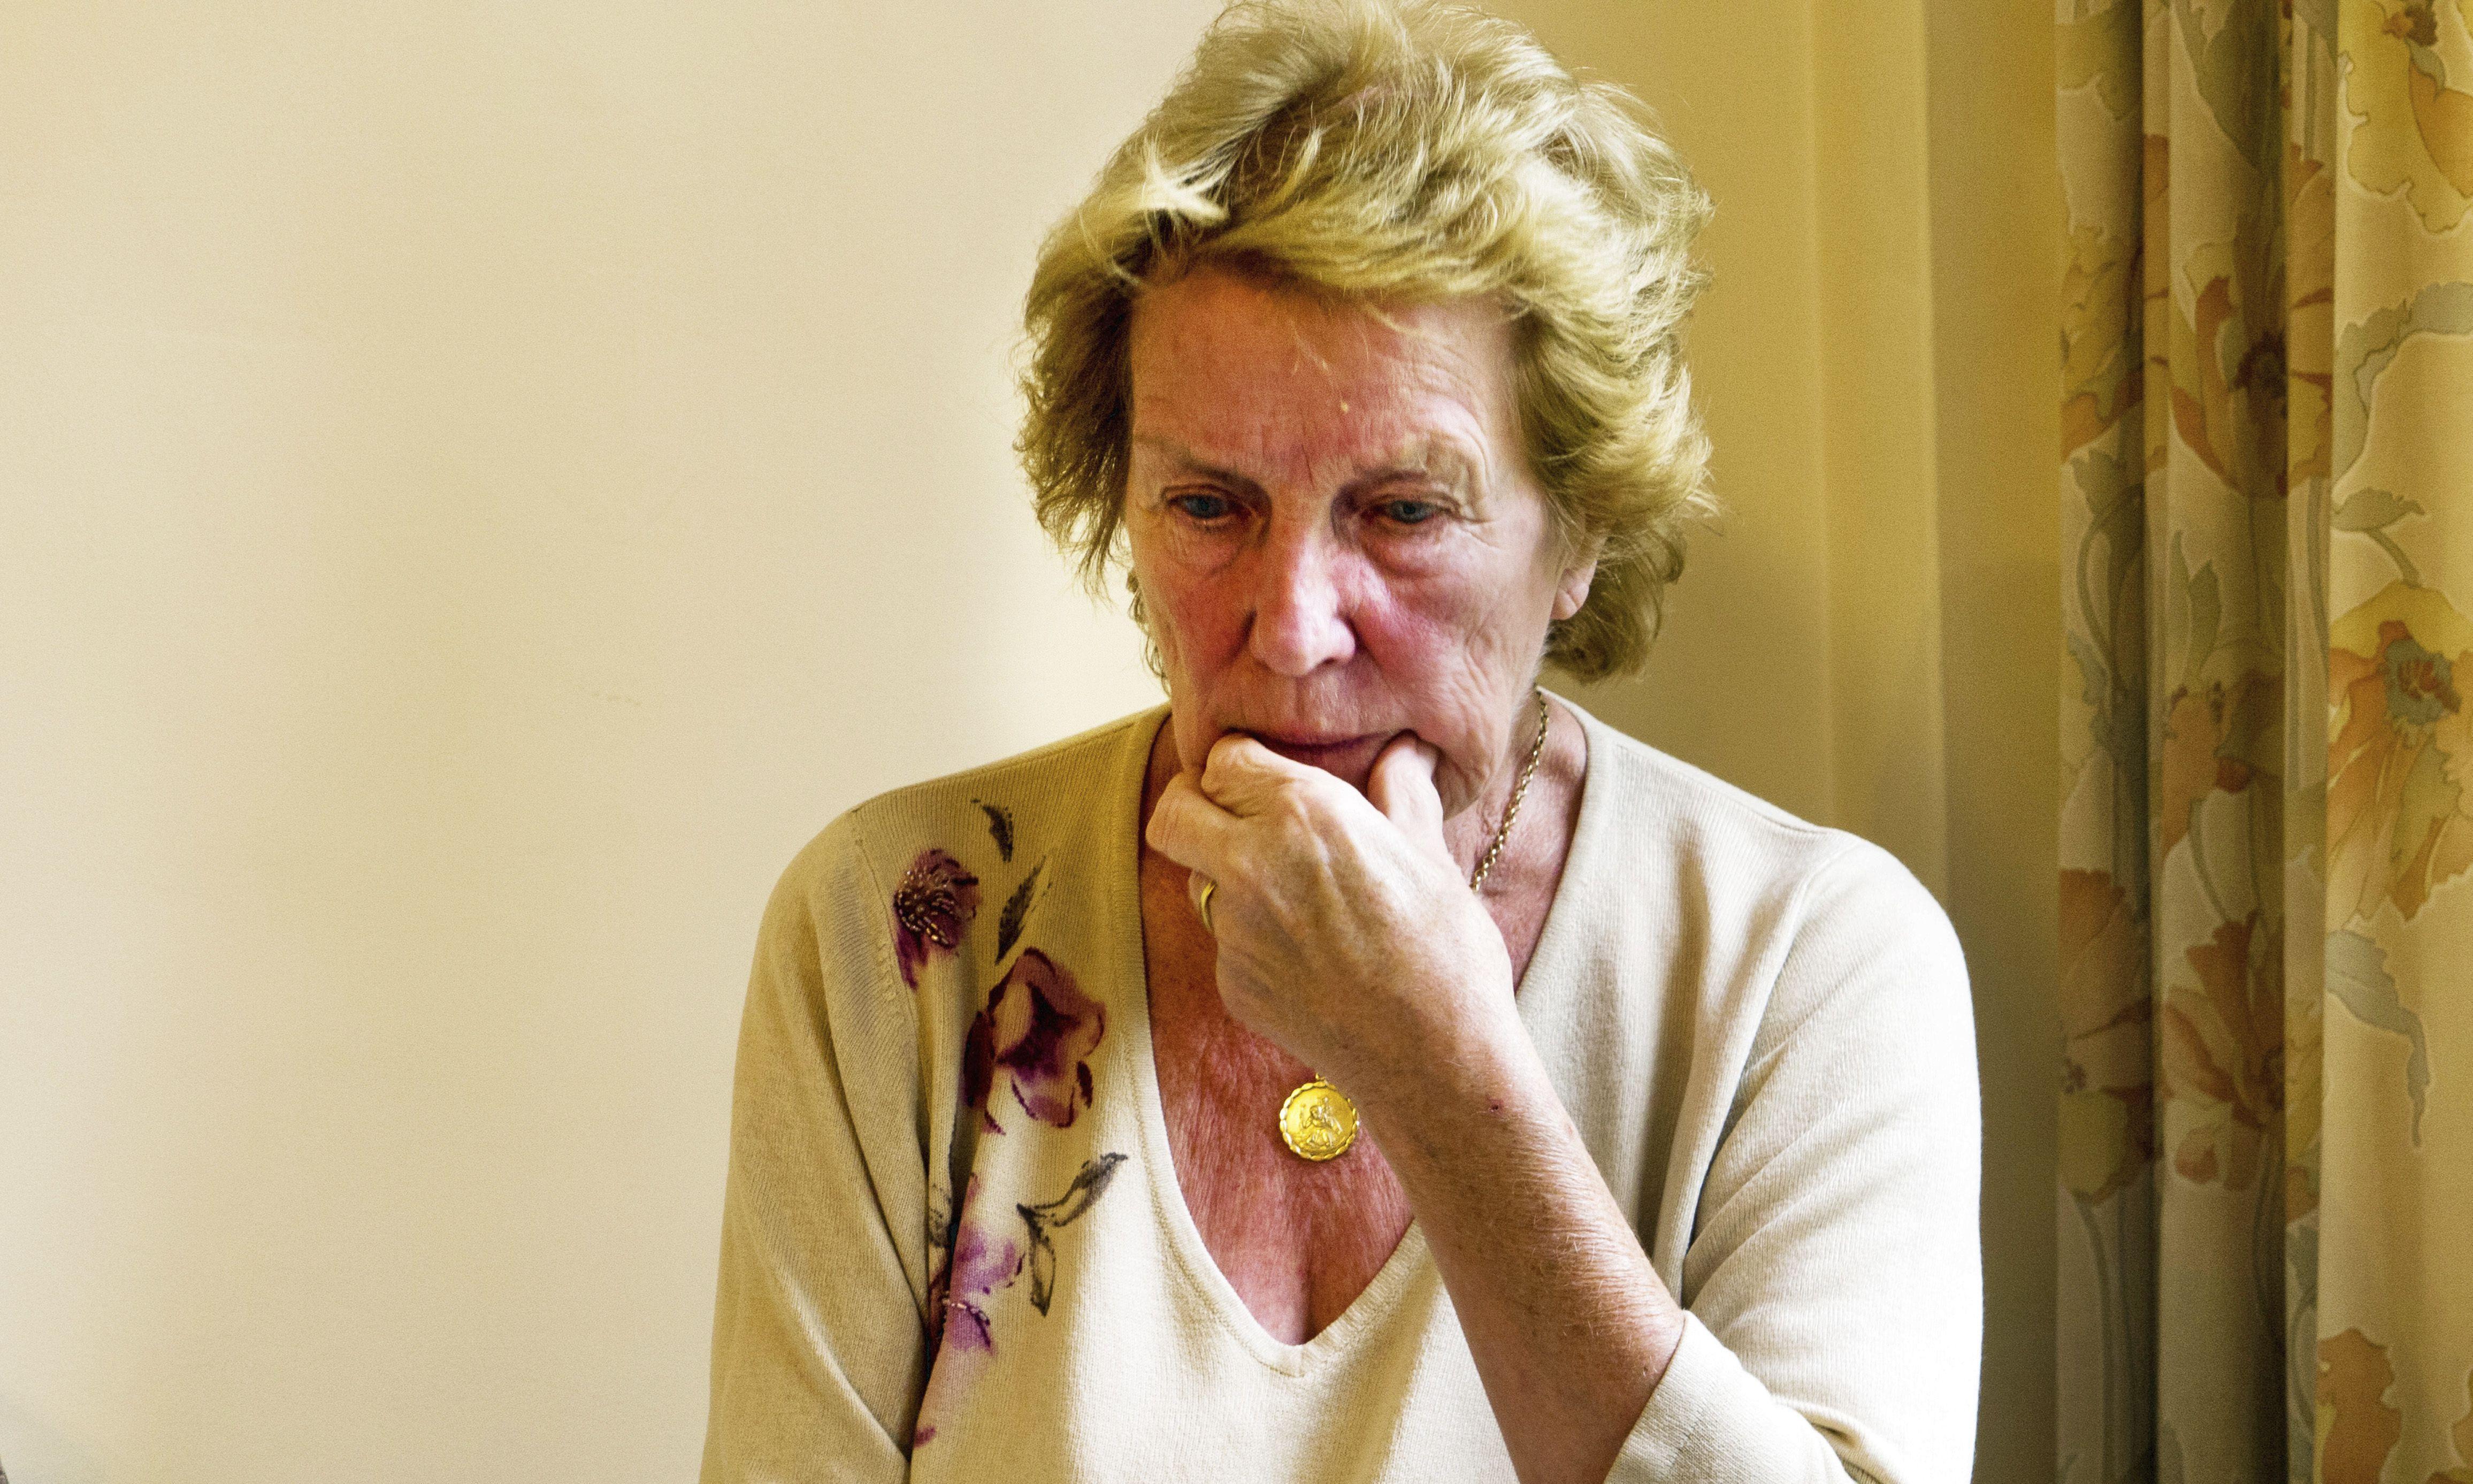 Seven ways to help avoid dementia